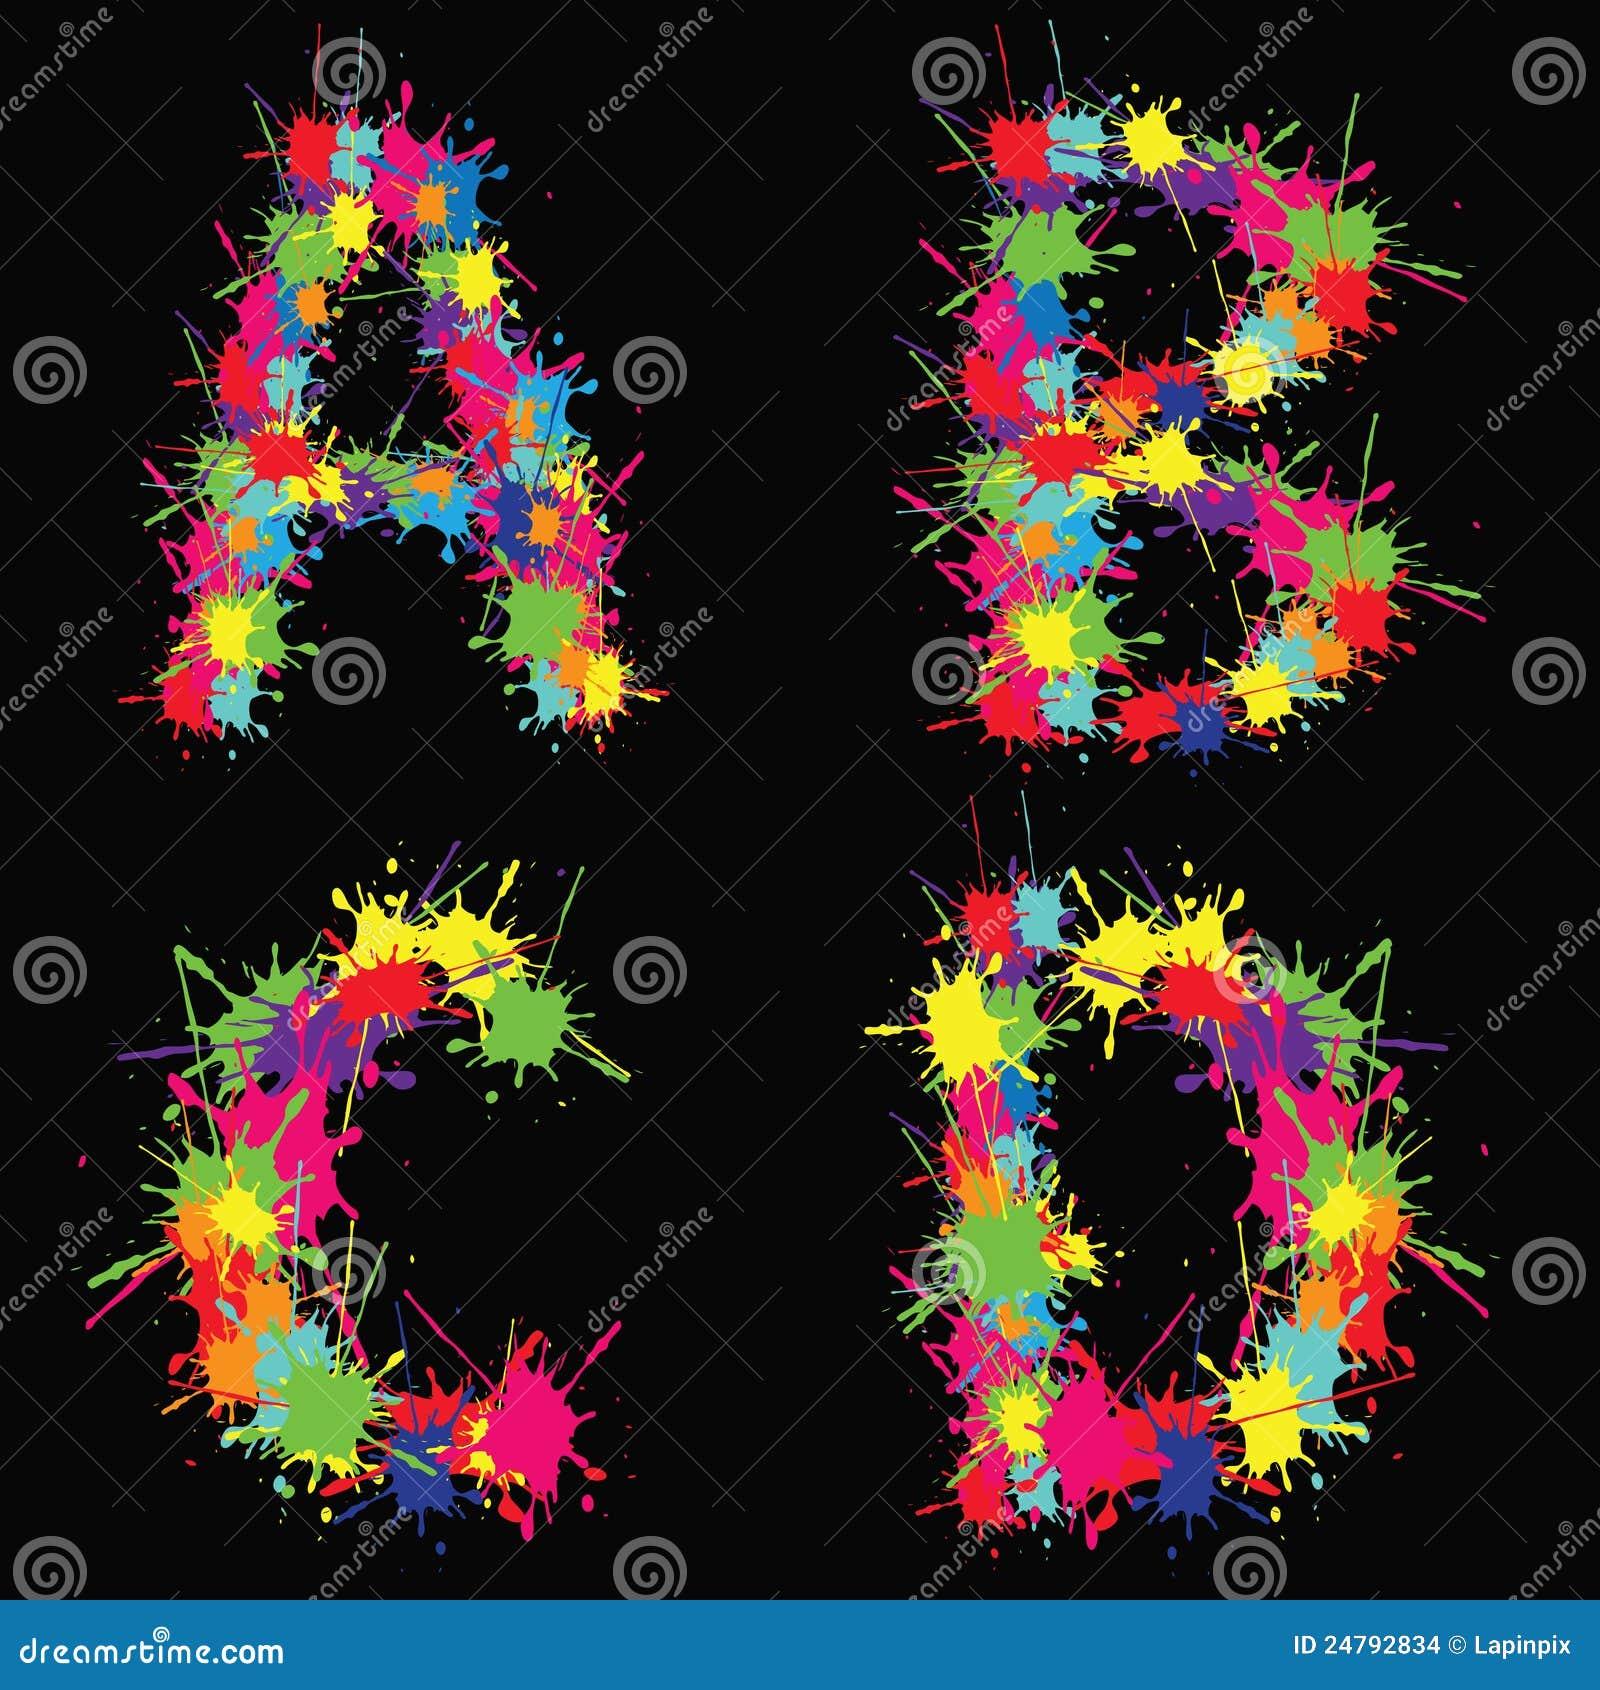 Abcd ζωηρόχρωμο διάνυσμα λεκέδων αλφάβητου